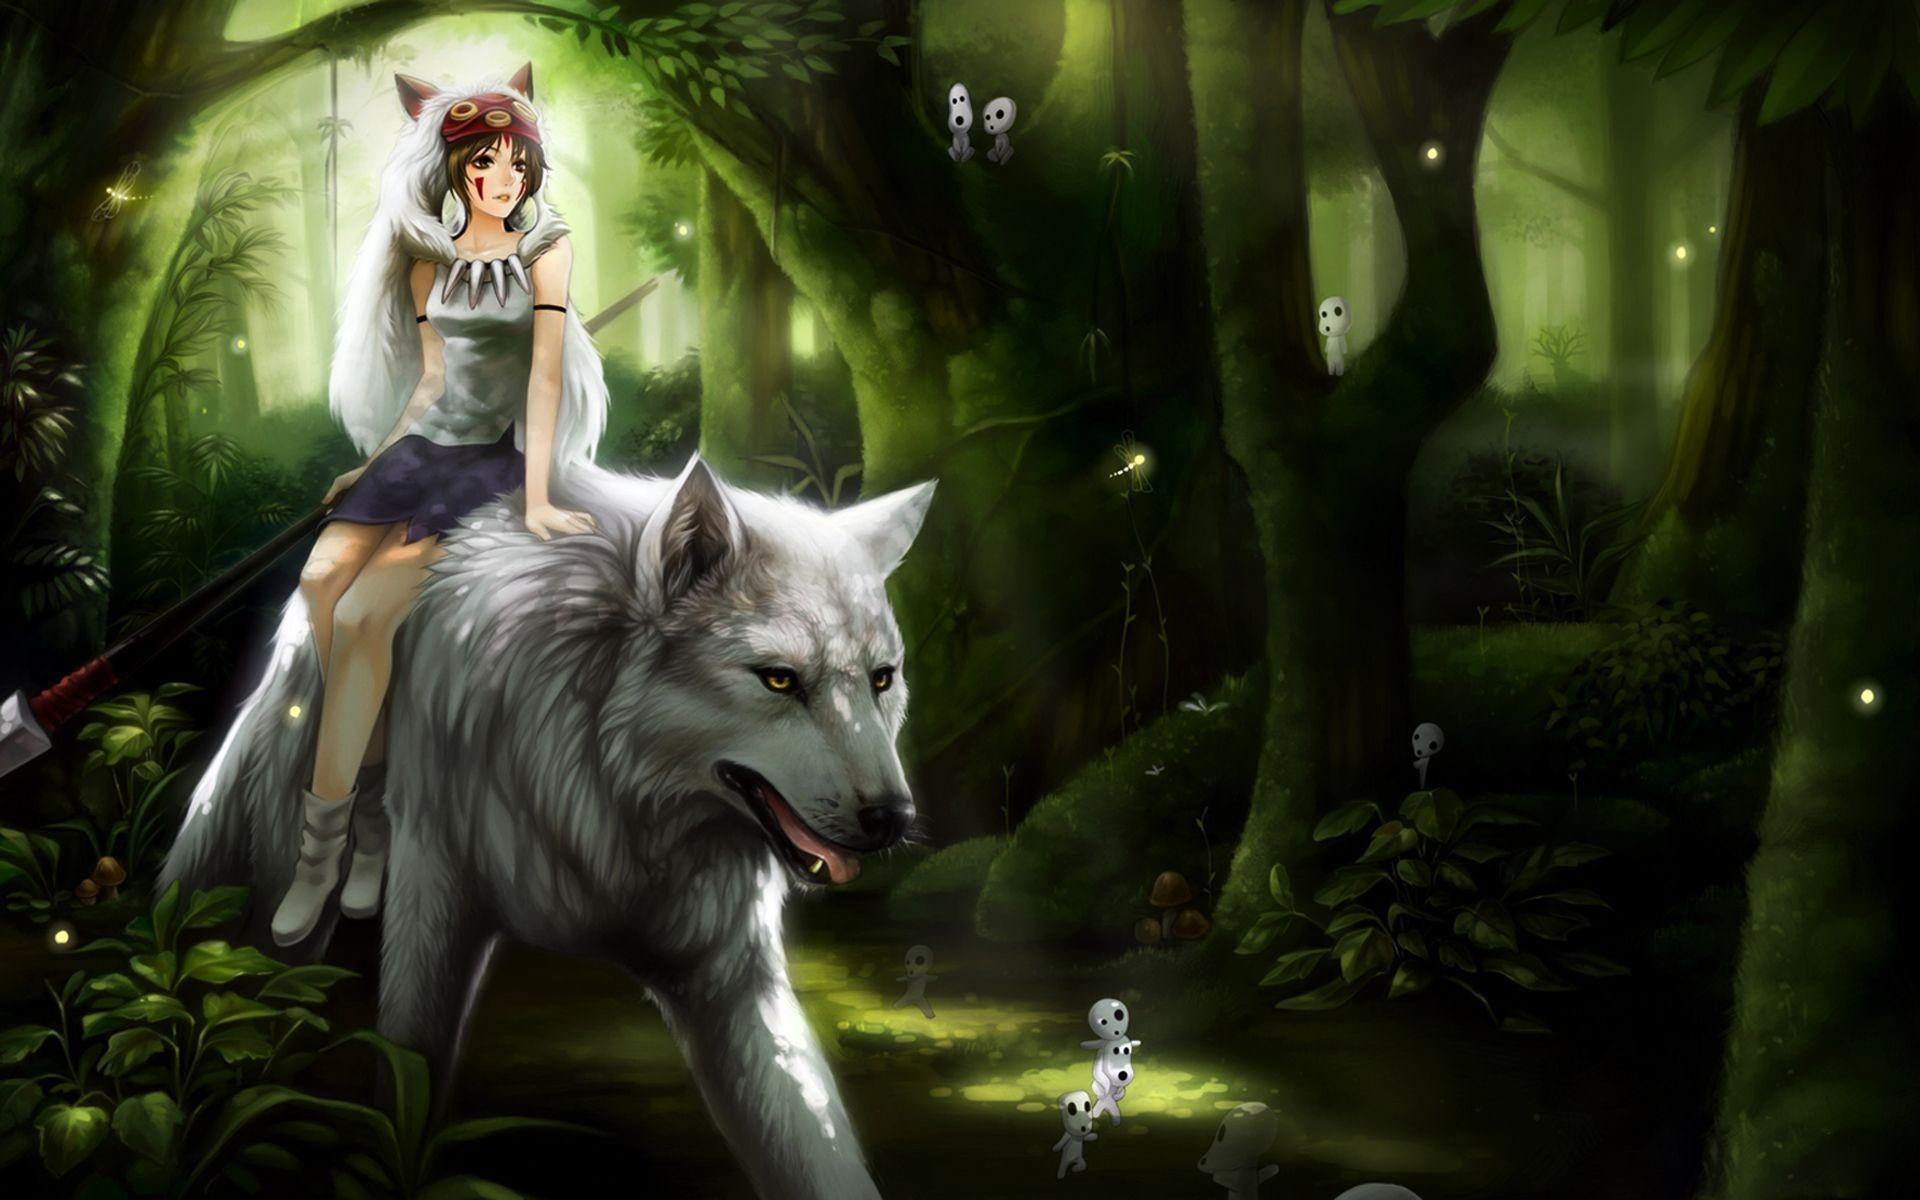 Wallpaper Anime Princess Mononoke Studio Ghibli Jungle